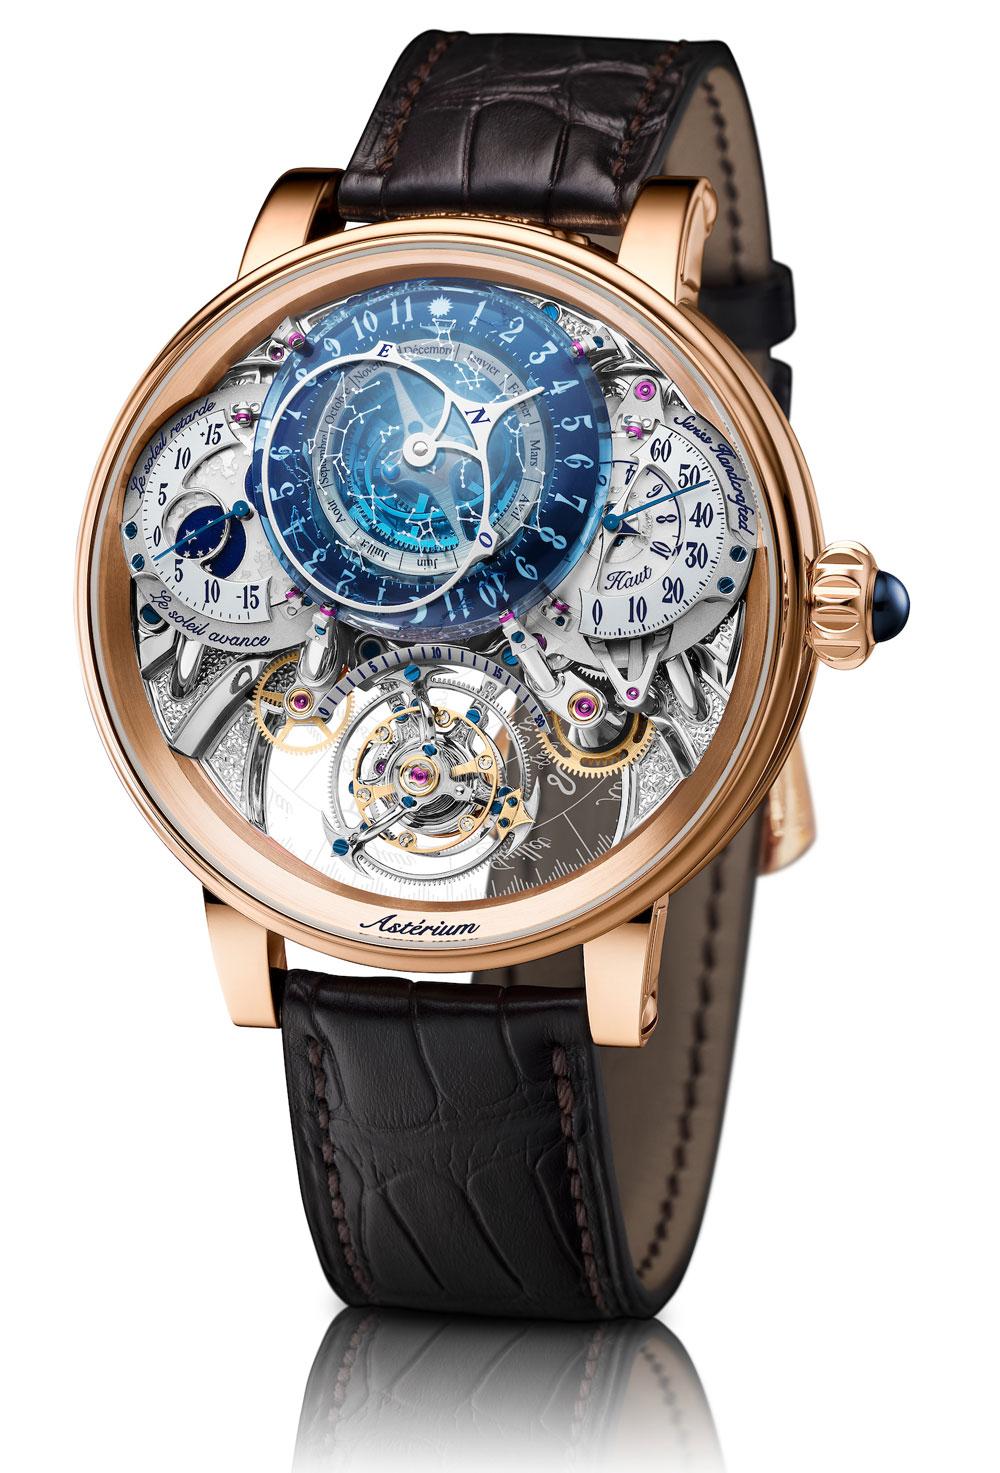 Reloj astronómico Bovet Recital 20 Asterium